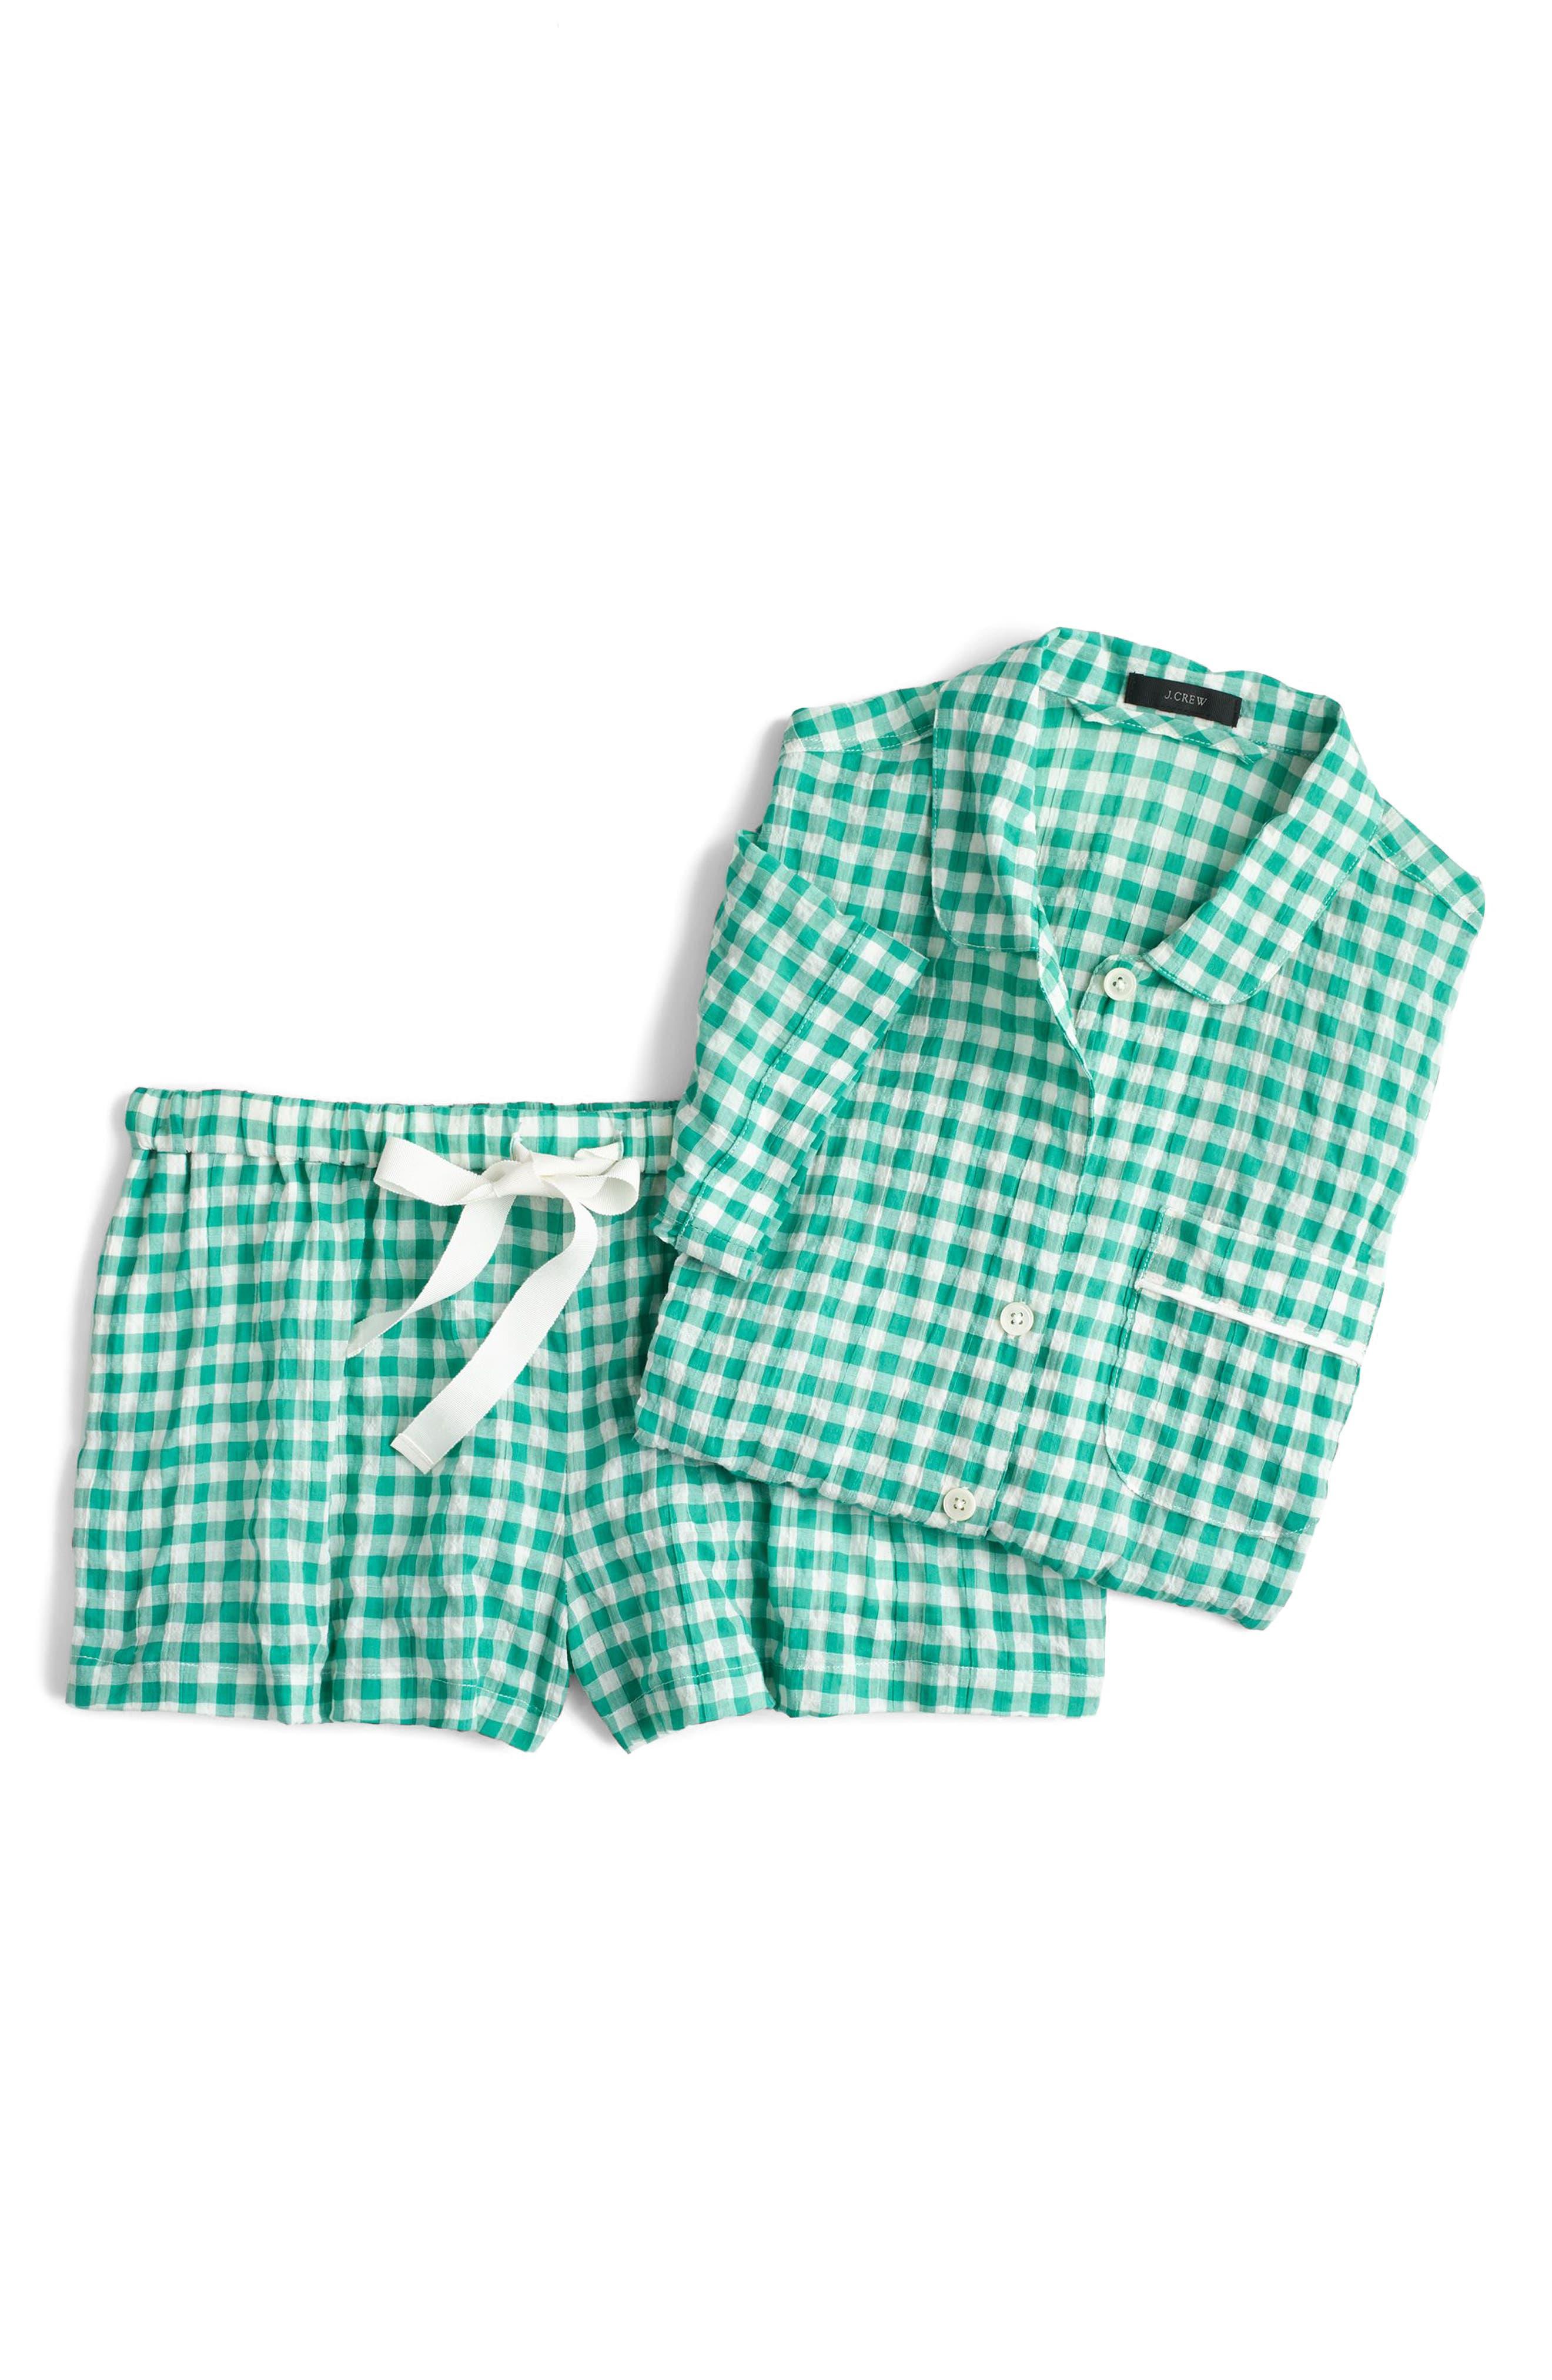 J.Crew Gingham Pajama Set,                         Main,                         color, Ivory Green